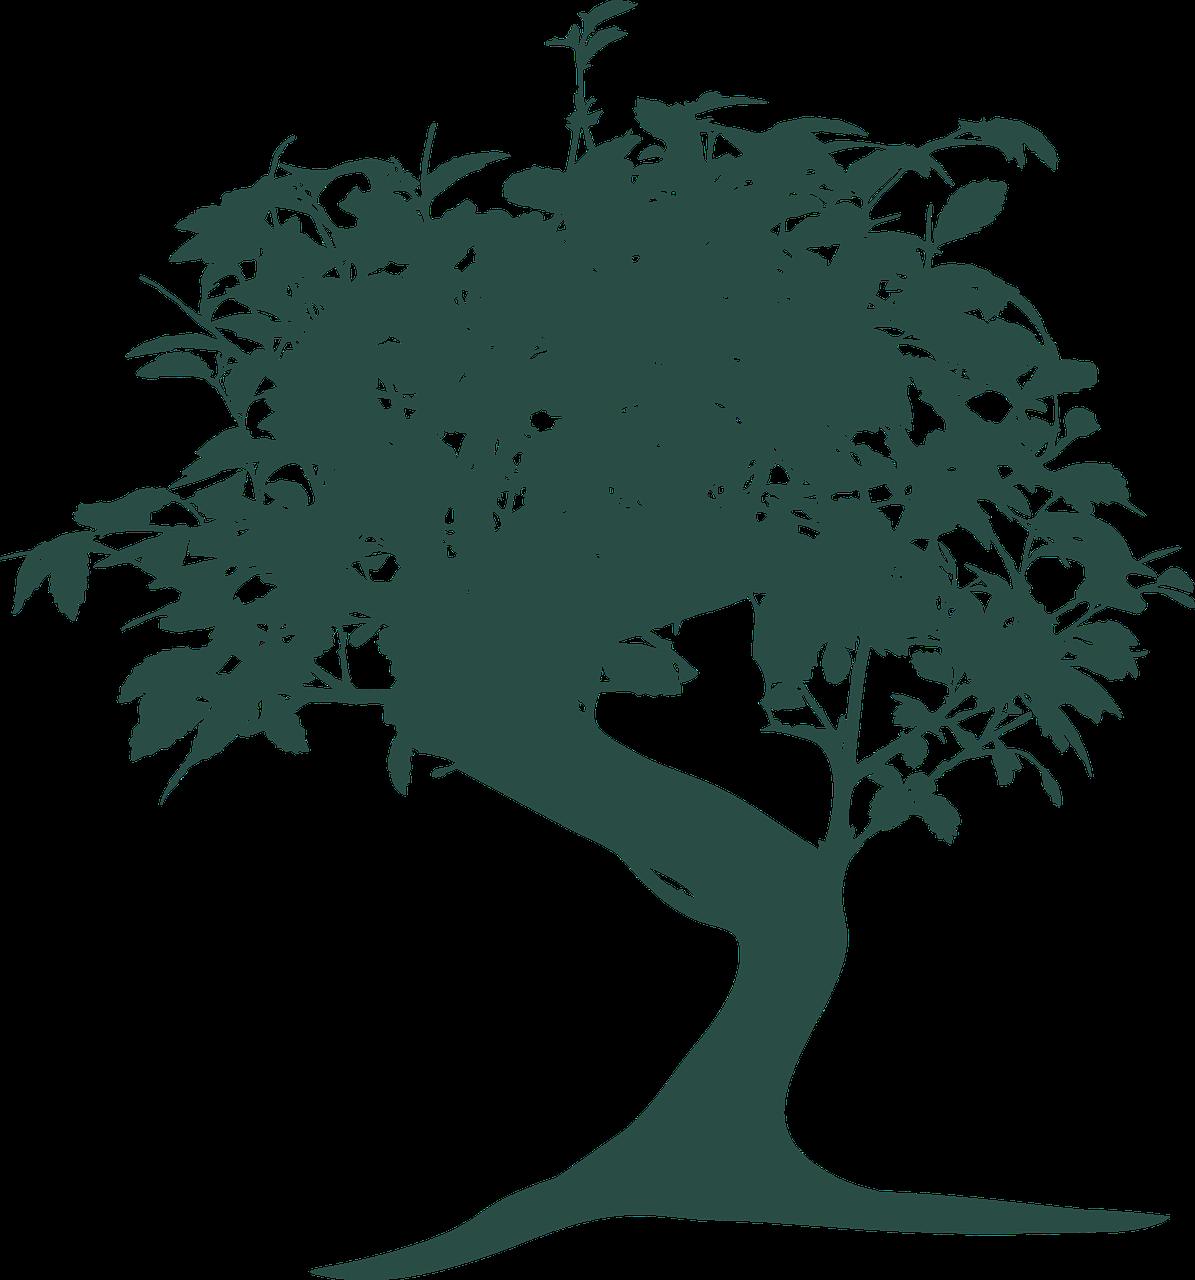 Bonsai Tree Nature Oriental Gardening Free Image From Needpix Com